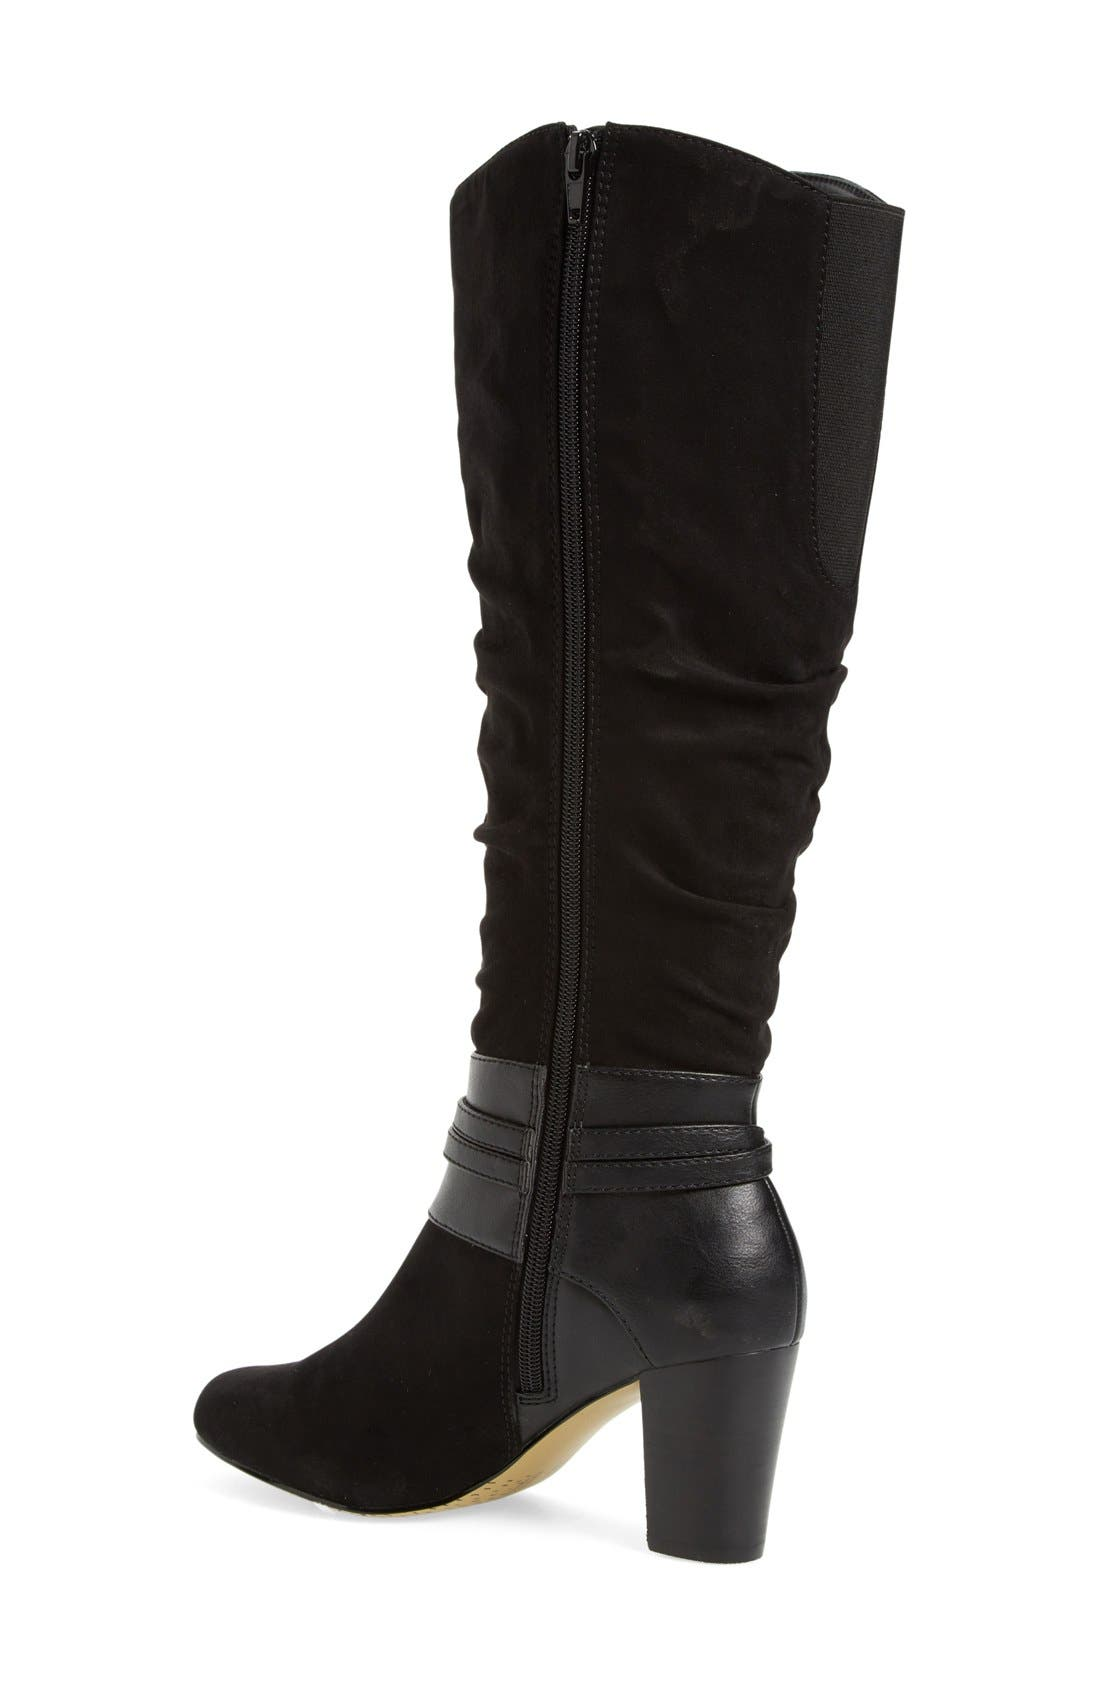 Alternate Image 2  - Bella Vita 'Tabitha II' Tall Boot (Women) (Wide Calf)